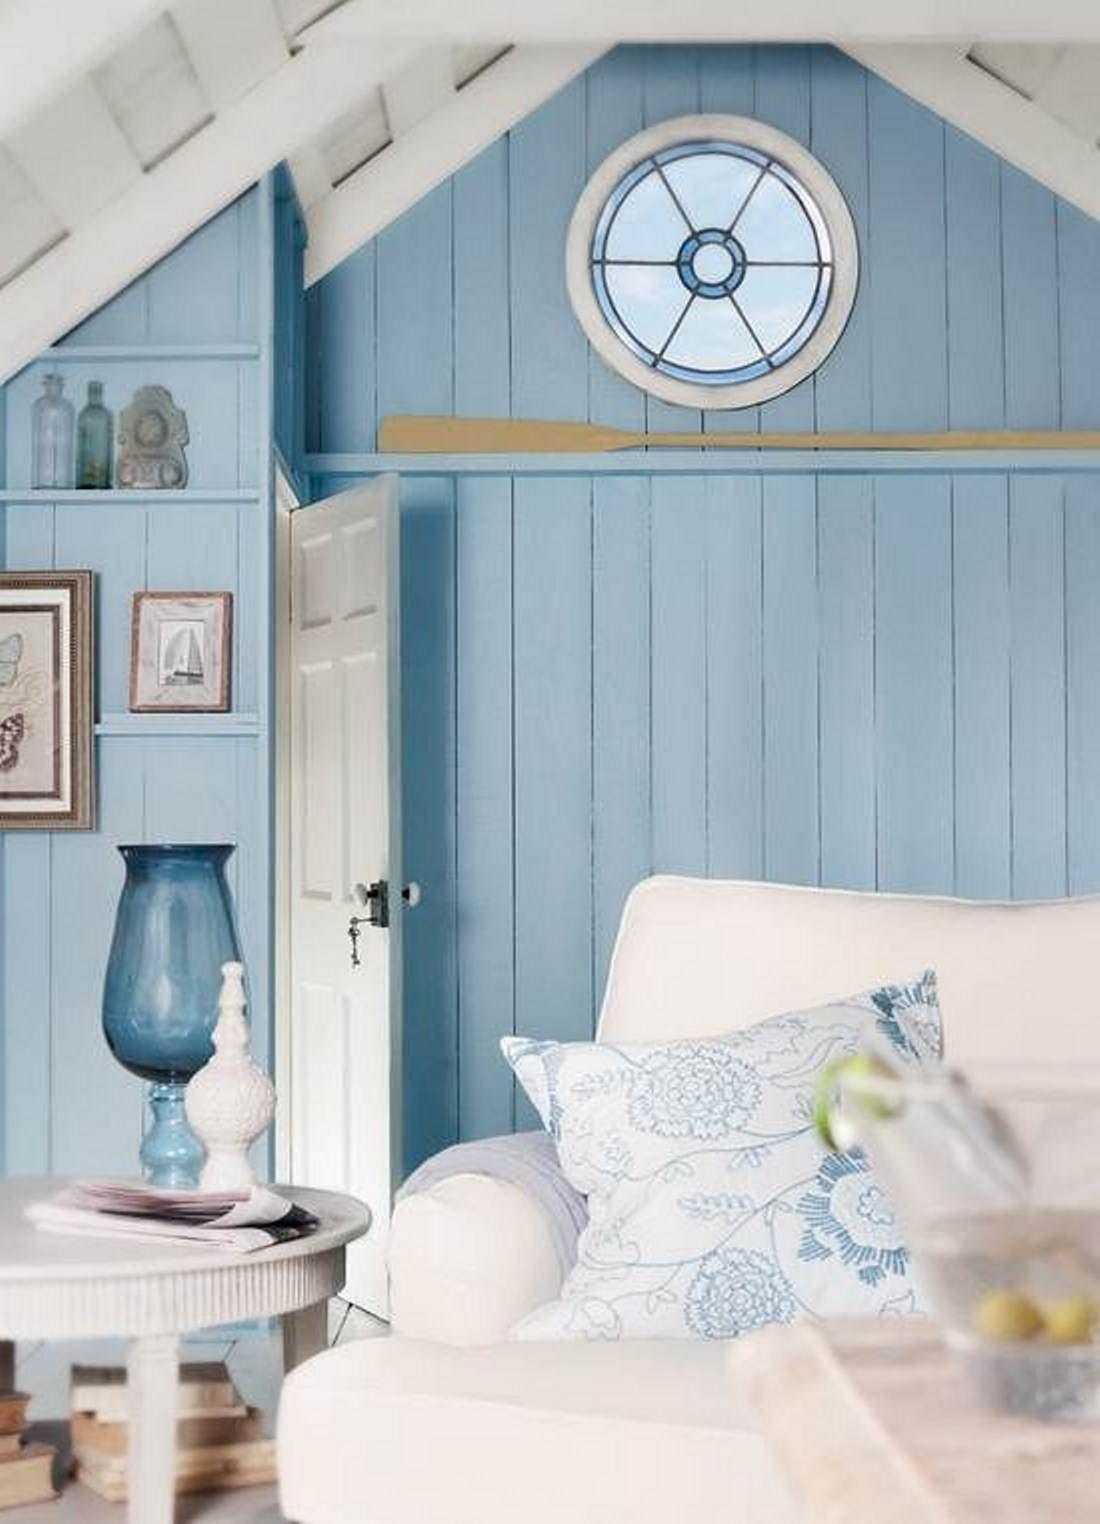 Beach Cottage Interior Design For Amazing Home inspiration 4